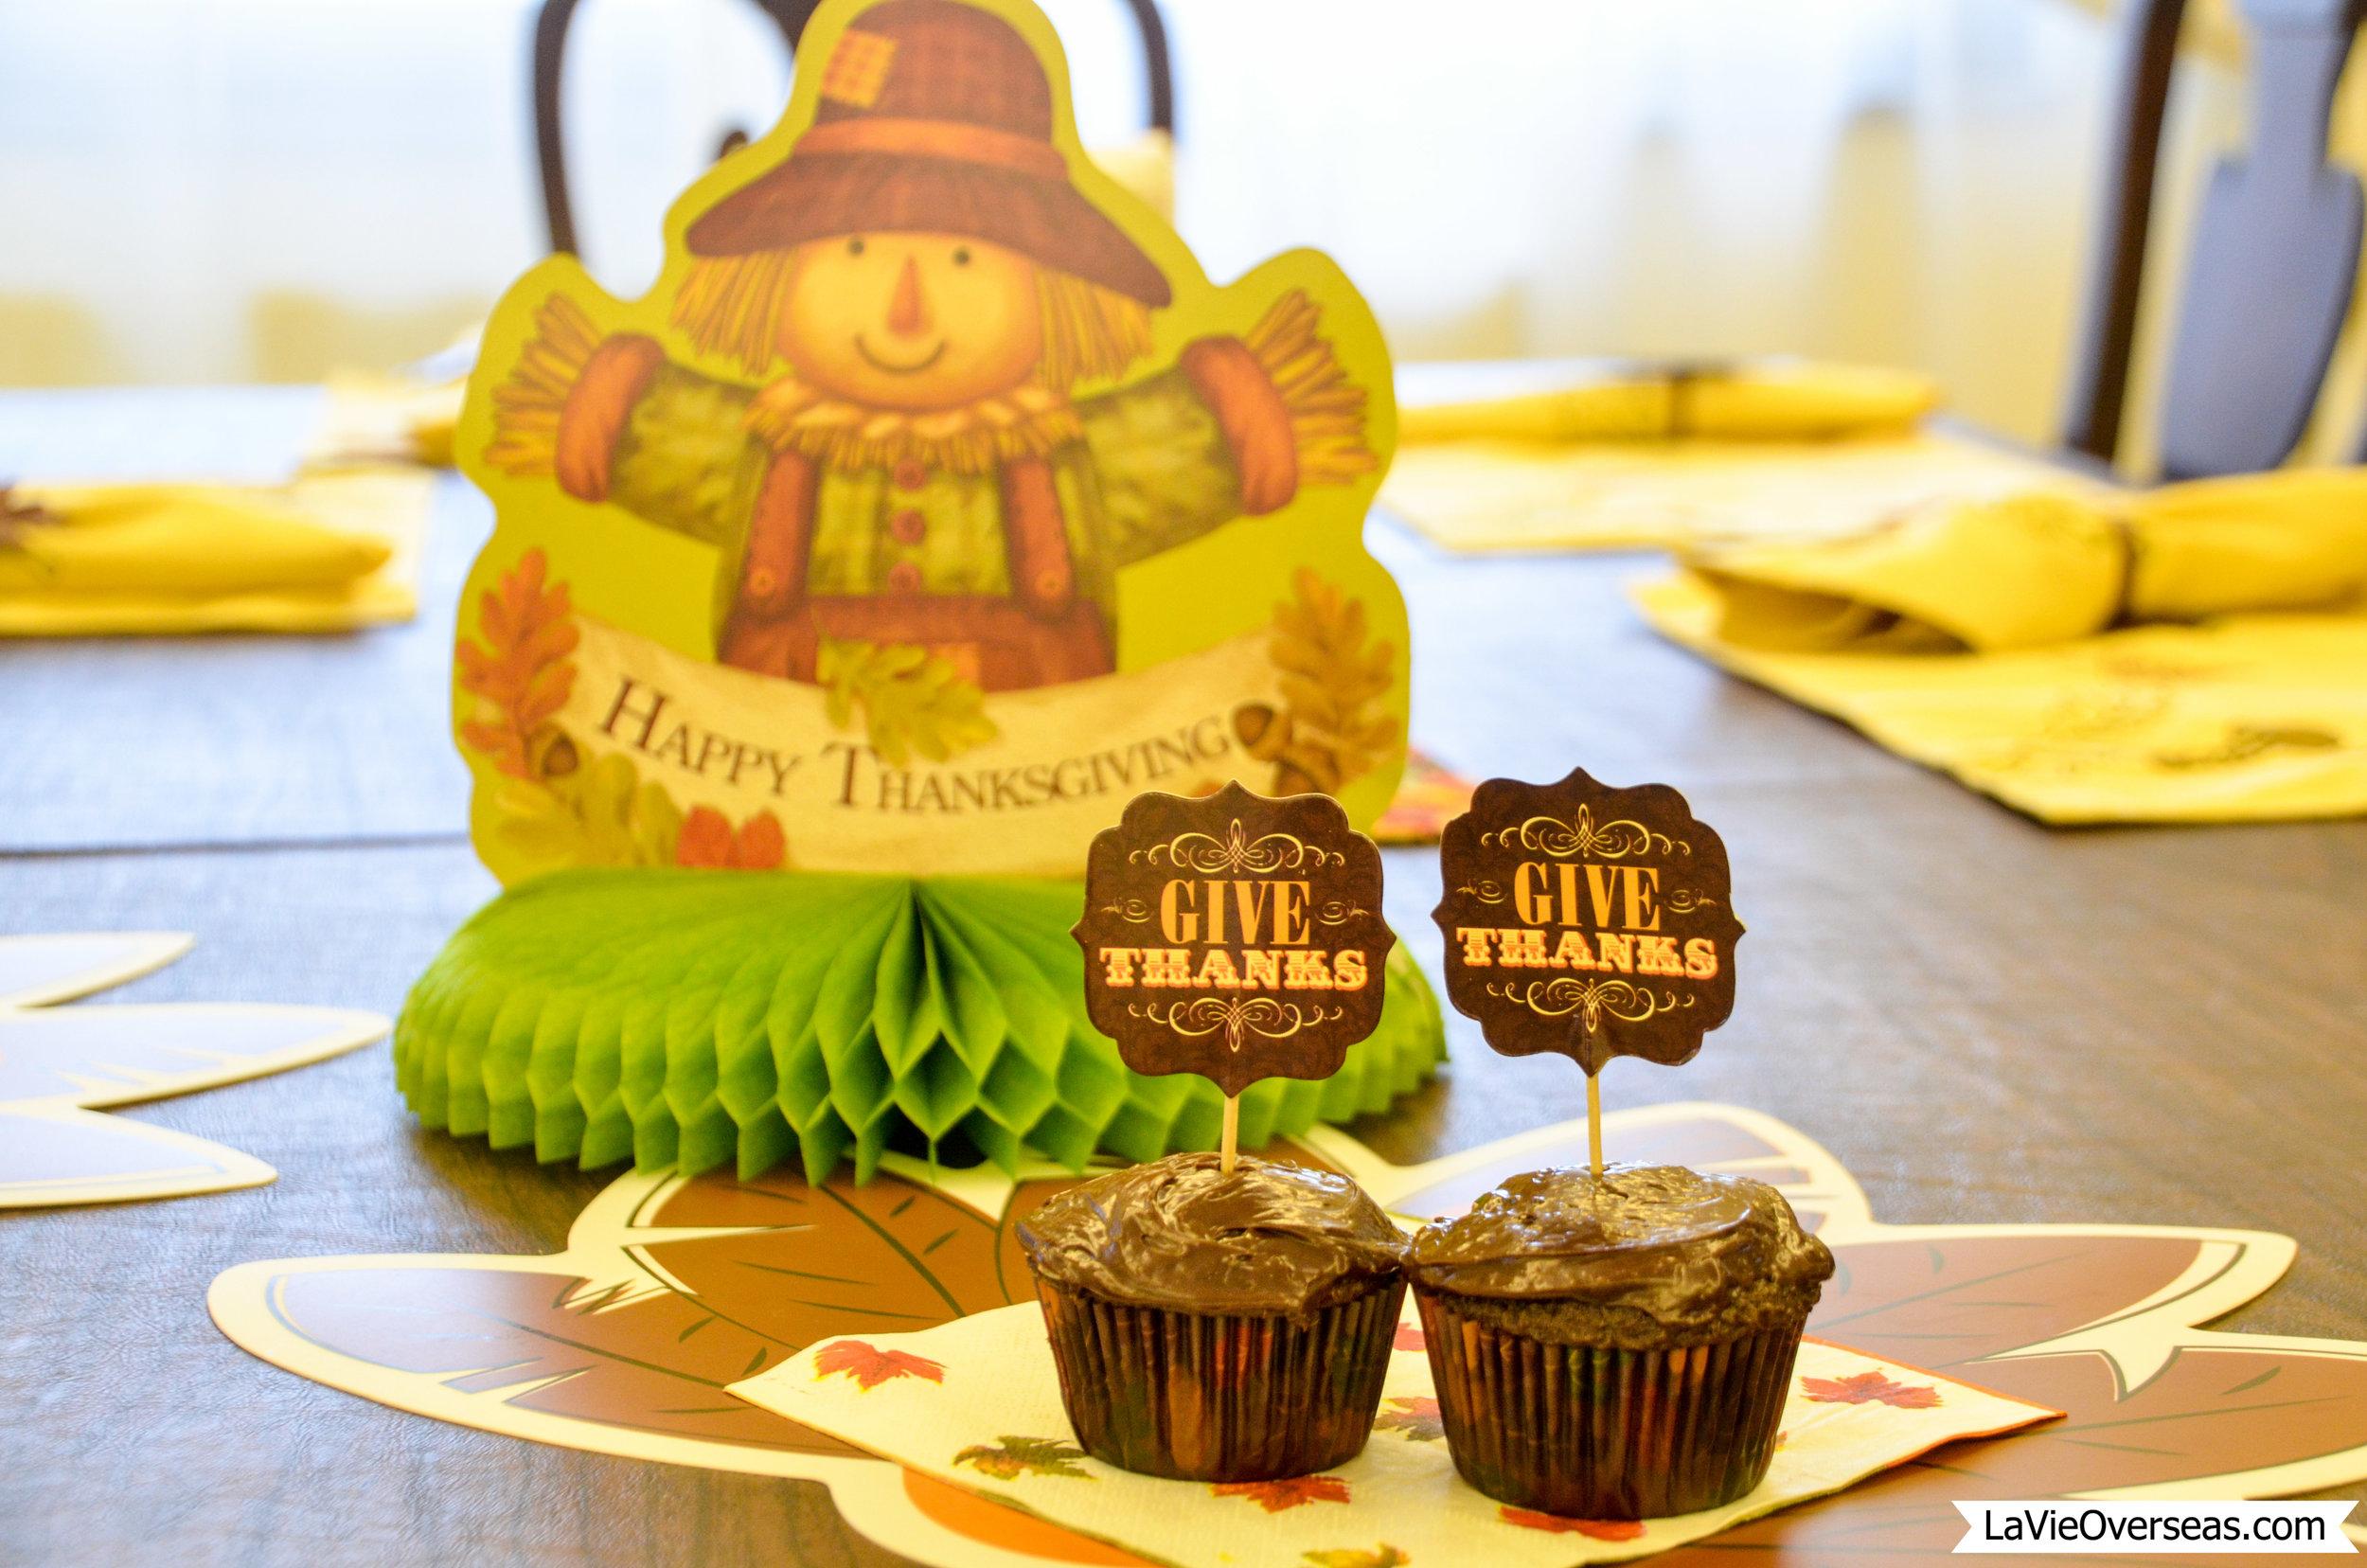 Happy-Thanksgiving-2015.jpg